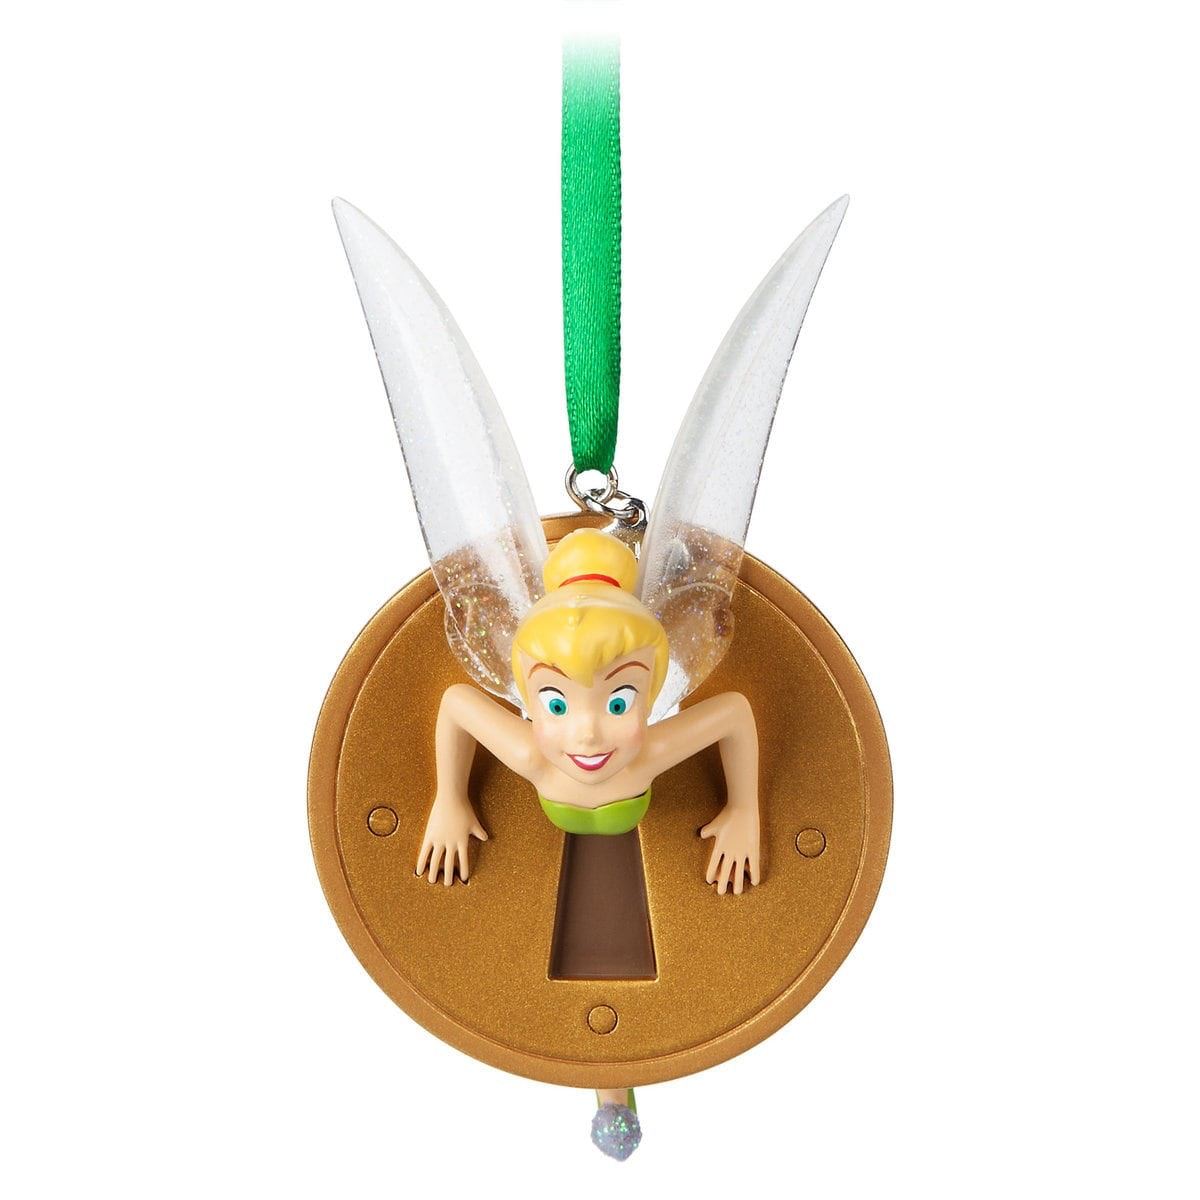 Tinker Bell Sketchbook Ornament - Peter Pan